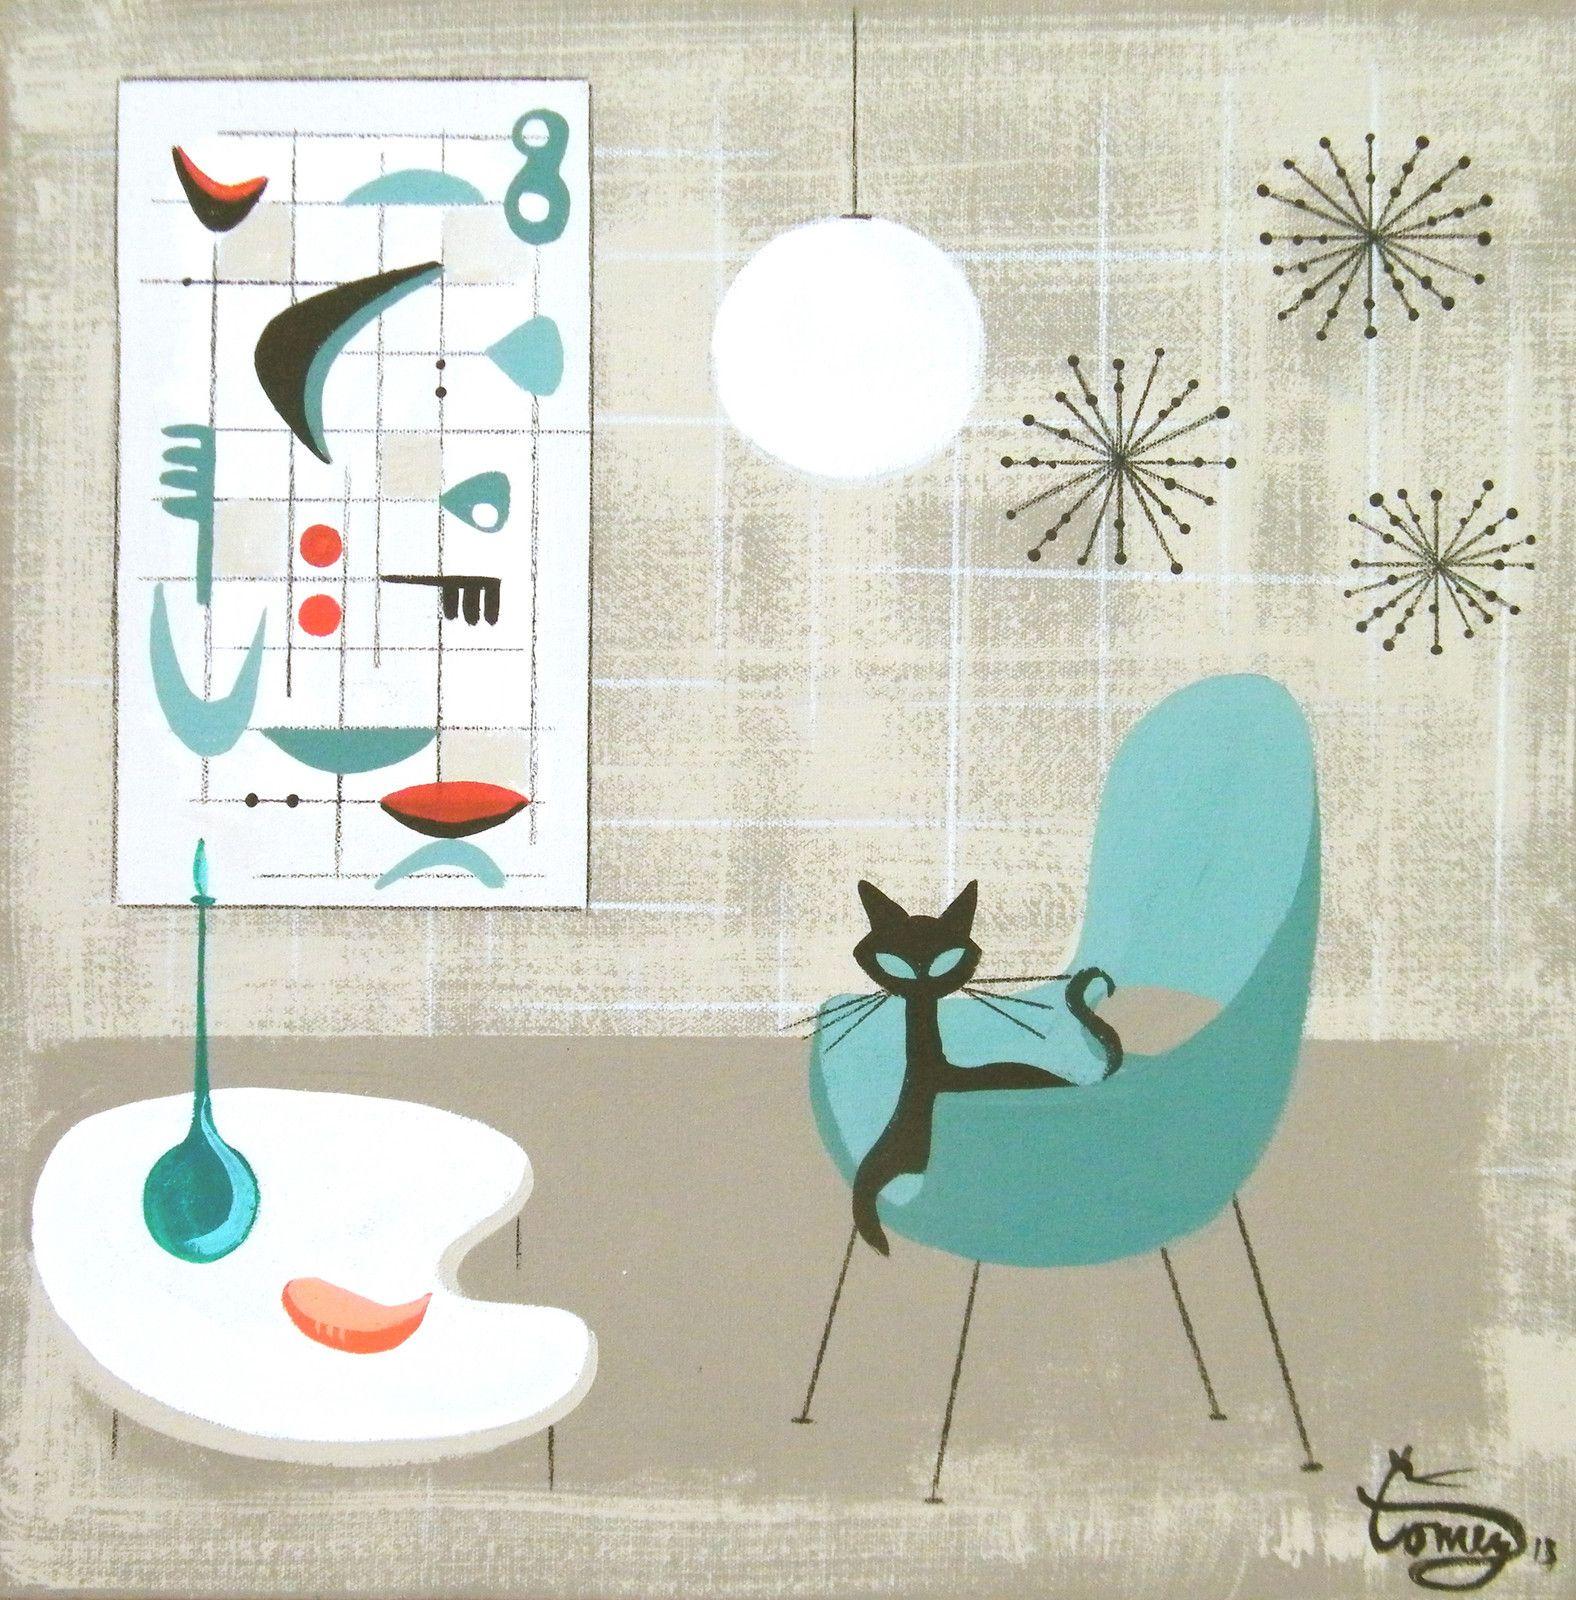 El Gato Gomez, I Just Love Her Paintings/prints!